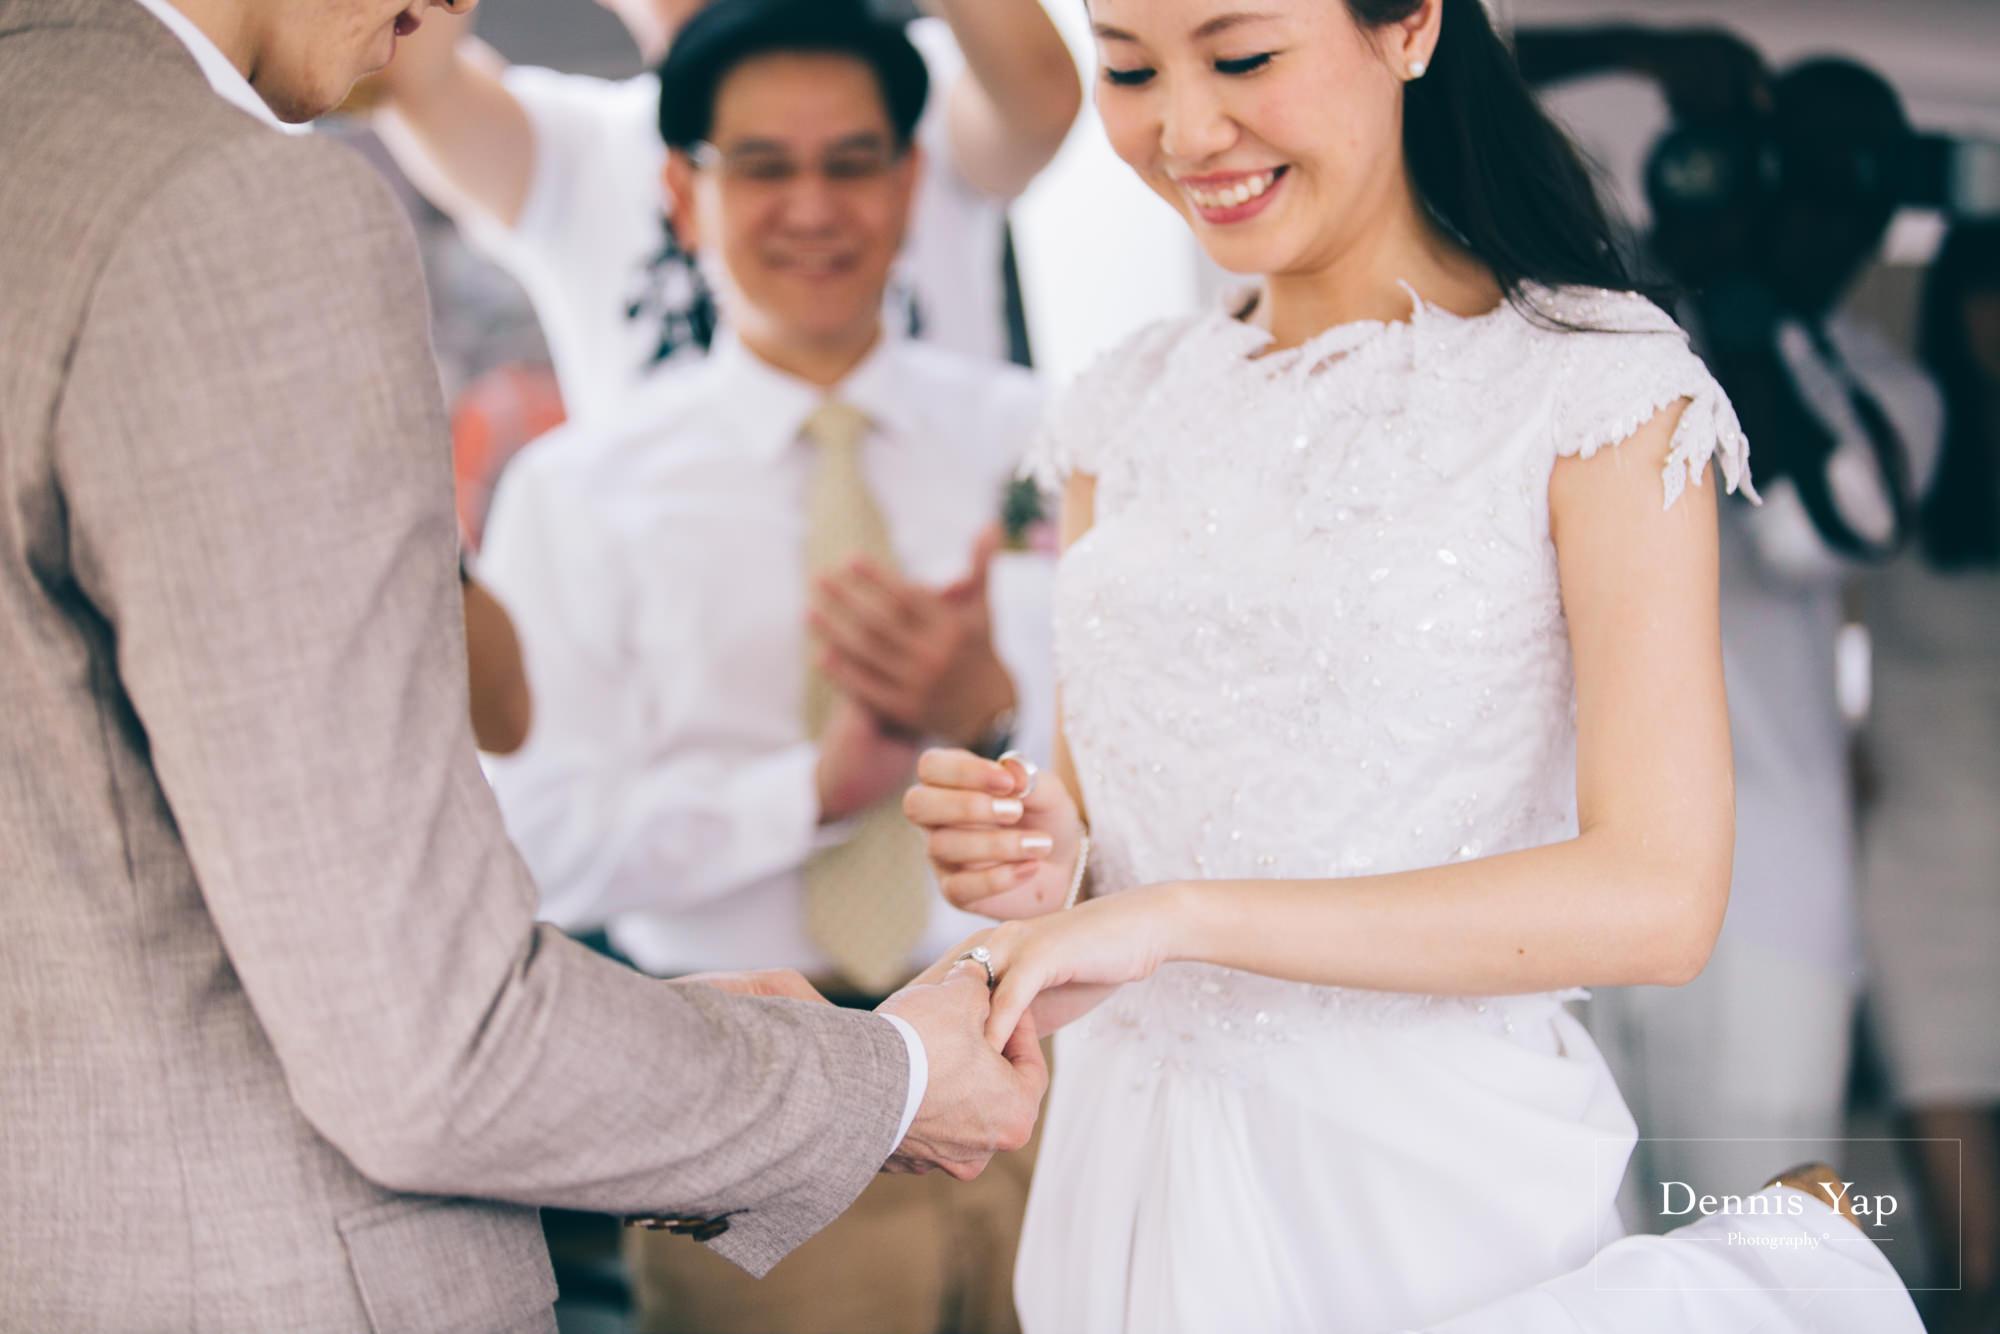 danny sherine wedding reception registration of marriage yacht fun beloved sea dennis yap photography malaysia top wedding photographer-17.jpg